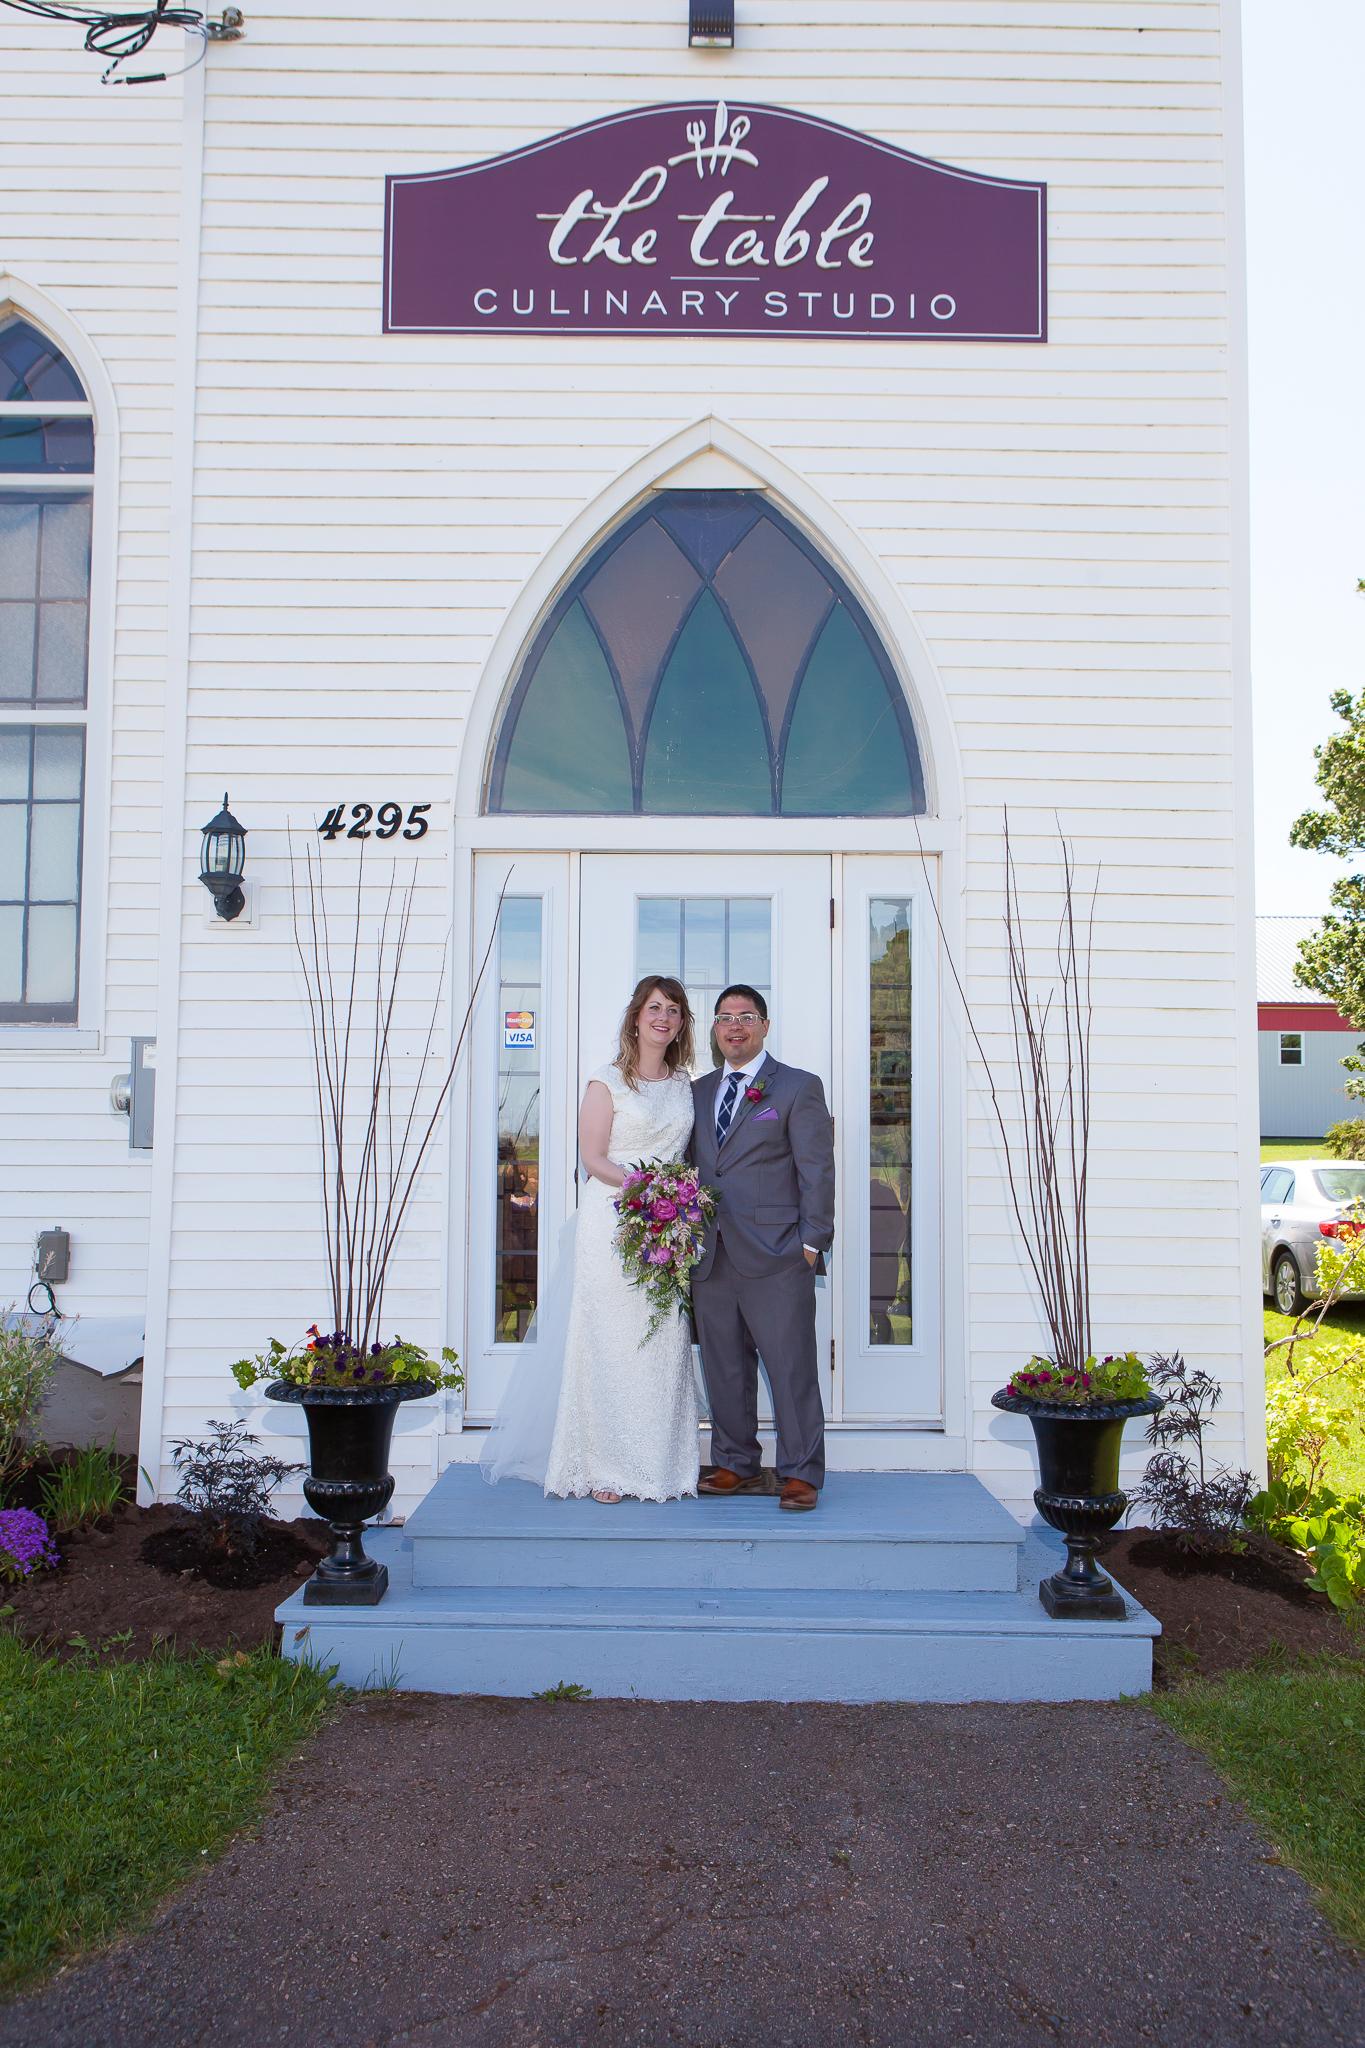 PEI Intimate Wedding Photographer 8